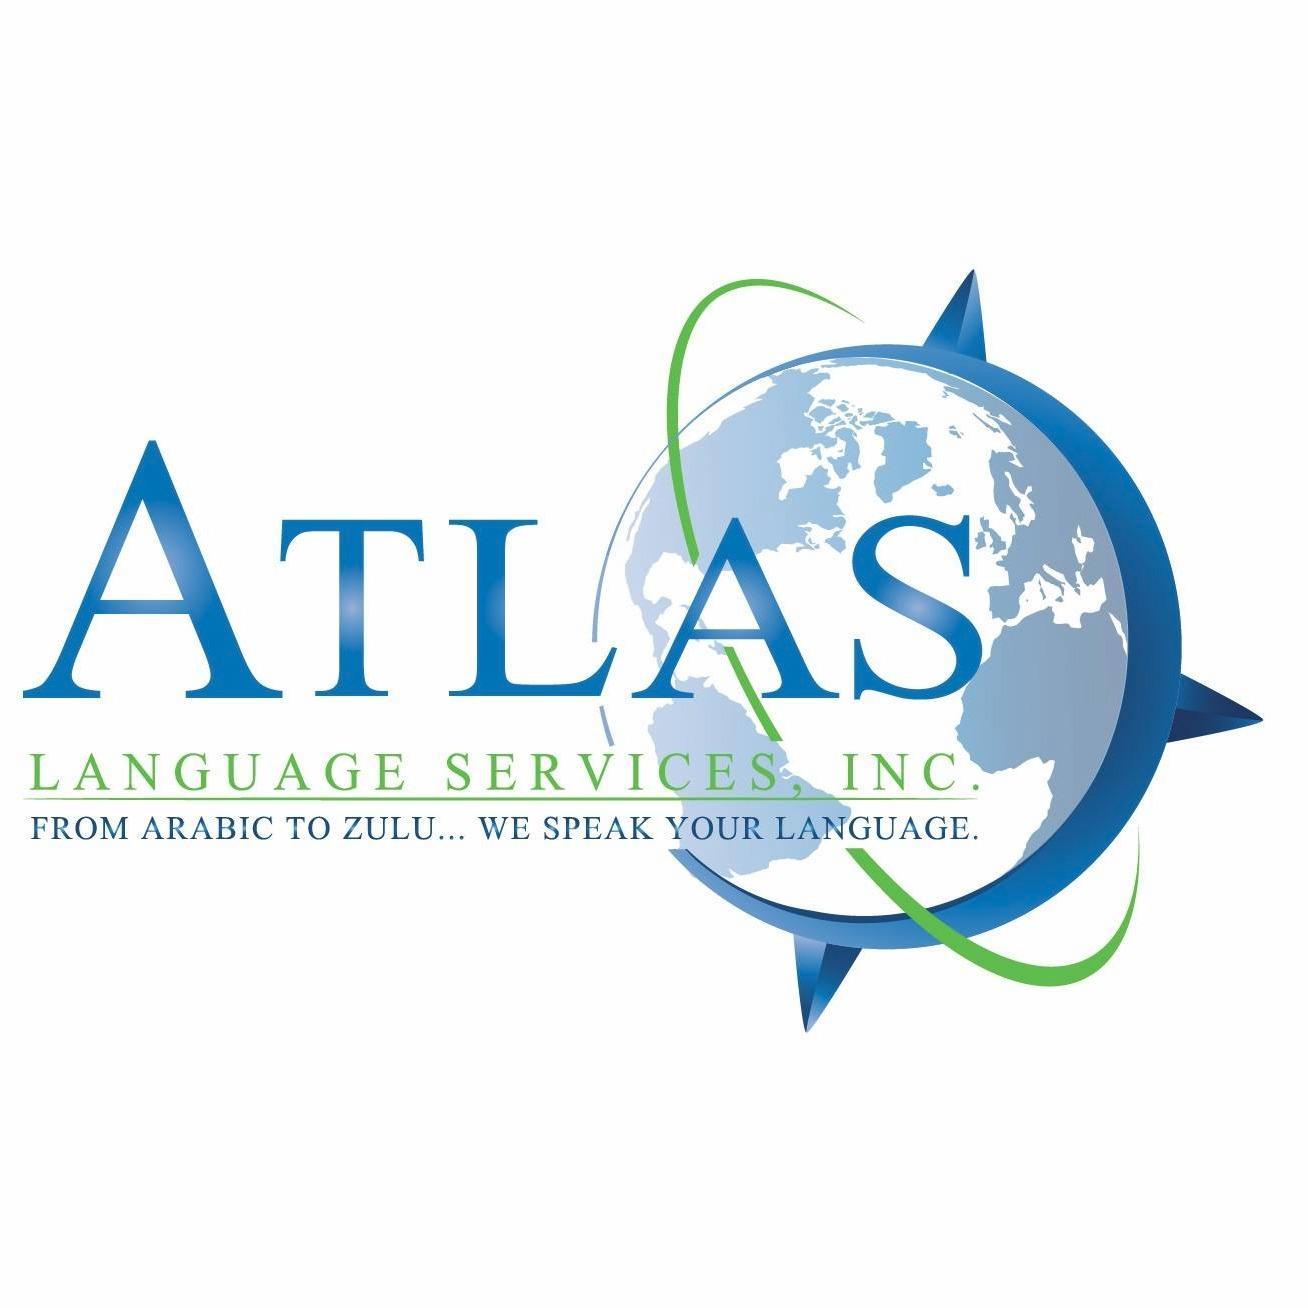 Atlas Language Services